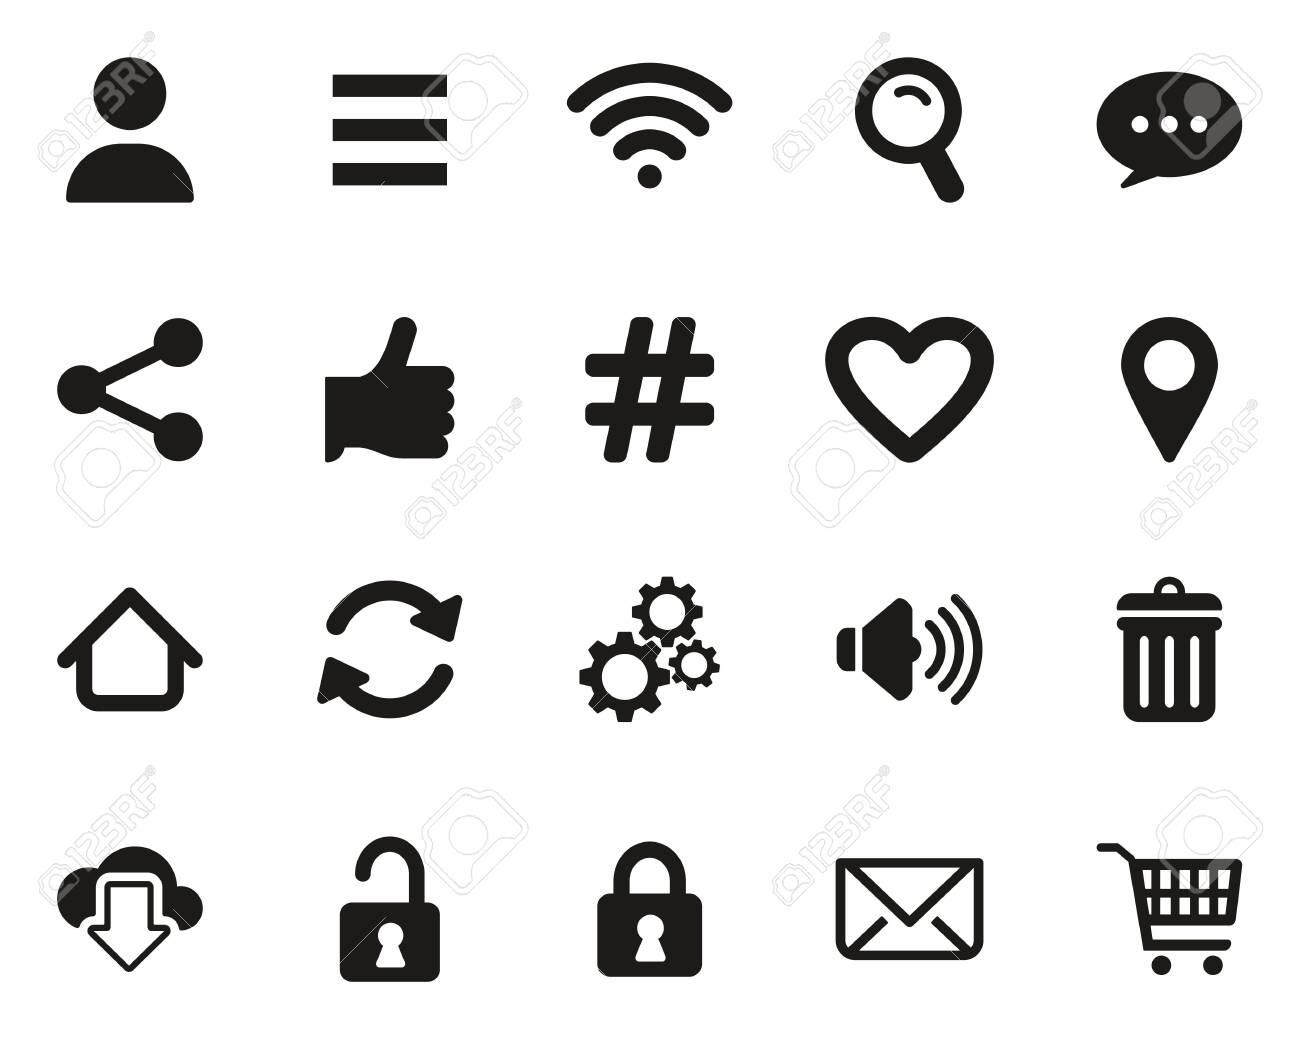 App Menu Icons Black & White Set Big - 137412169